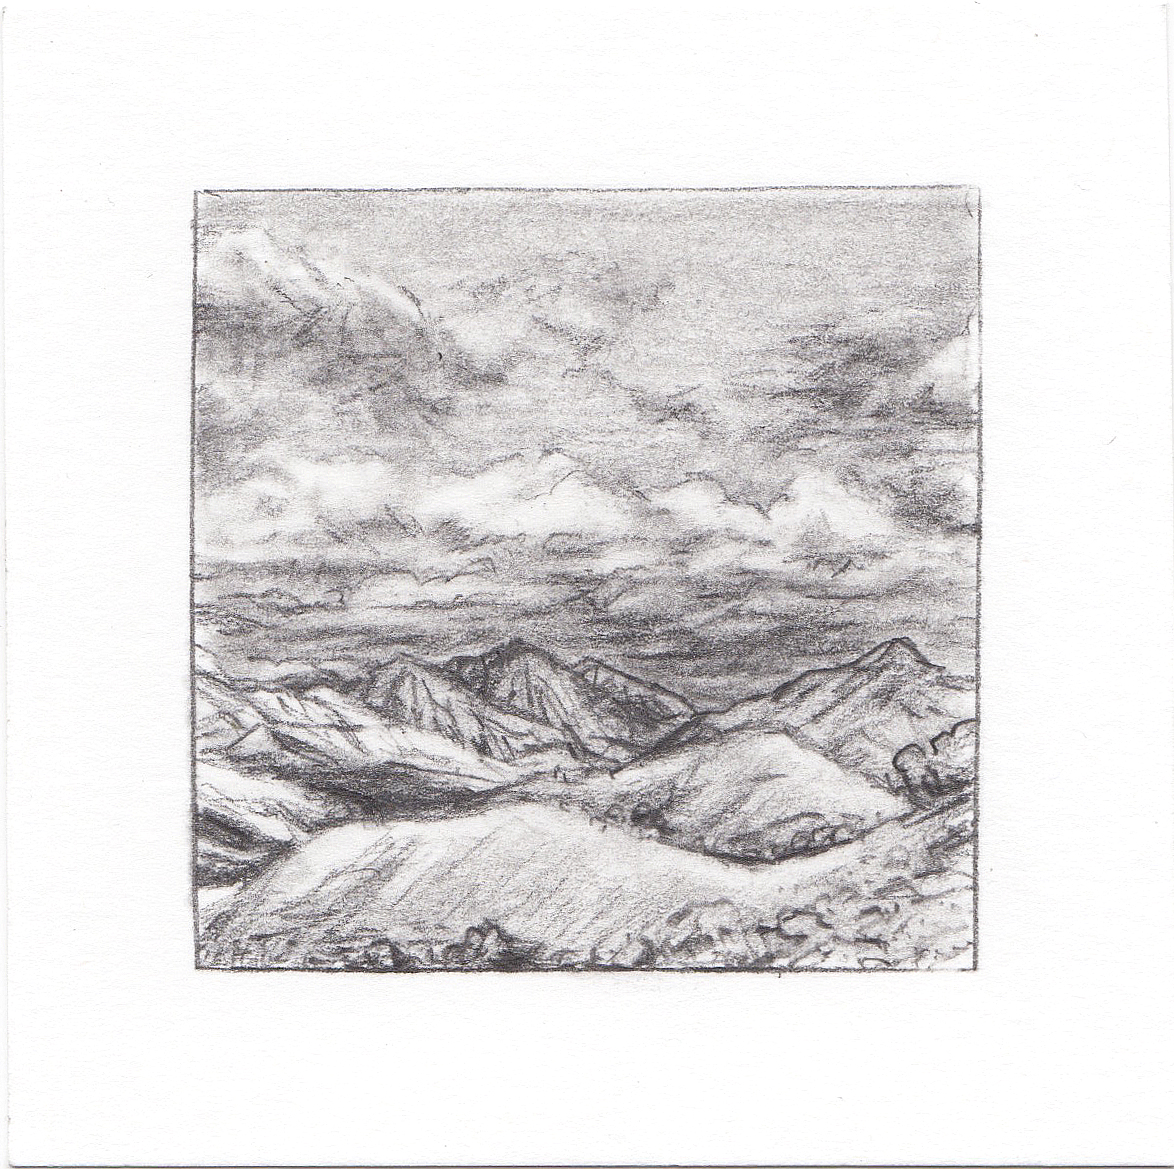 #3 Avenues Twin Peaks, SLC, Utah | 3x3 | graphite